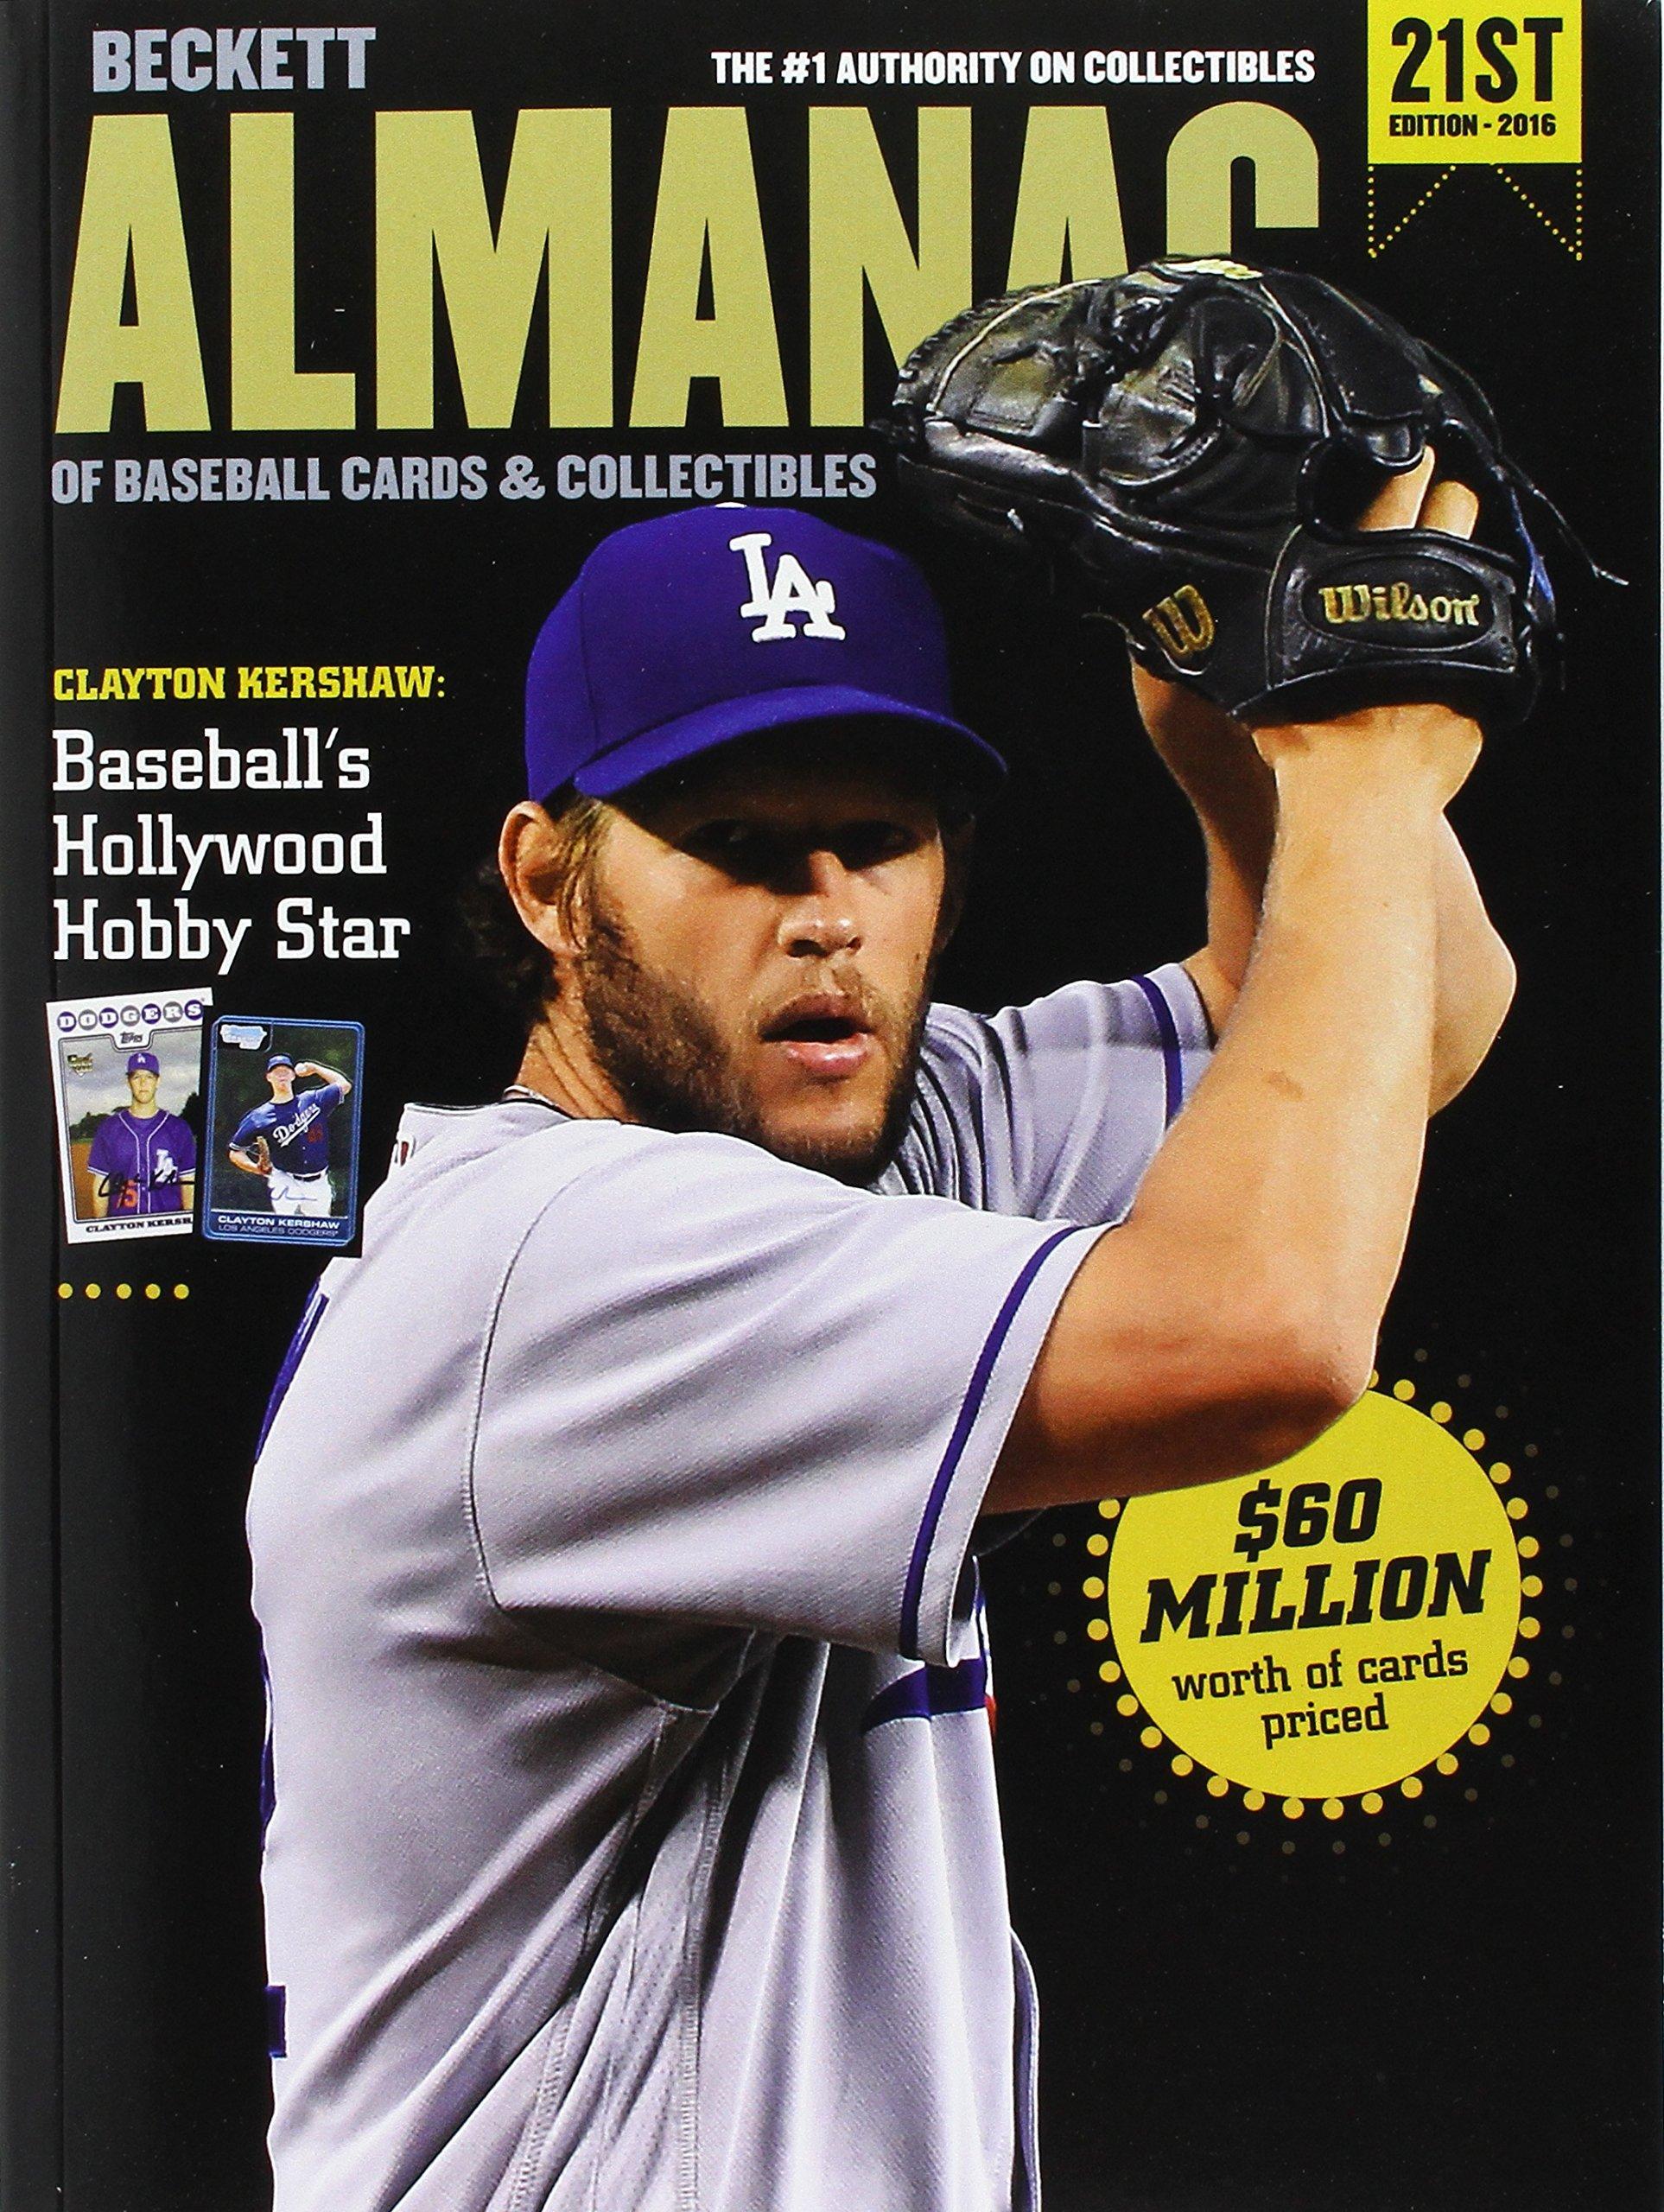 Beckett Baseball Almanac #21 (Beckett Almanac of Baseball Cards and Collectibles) pdf